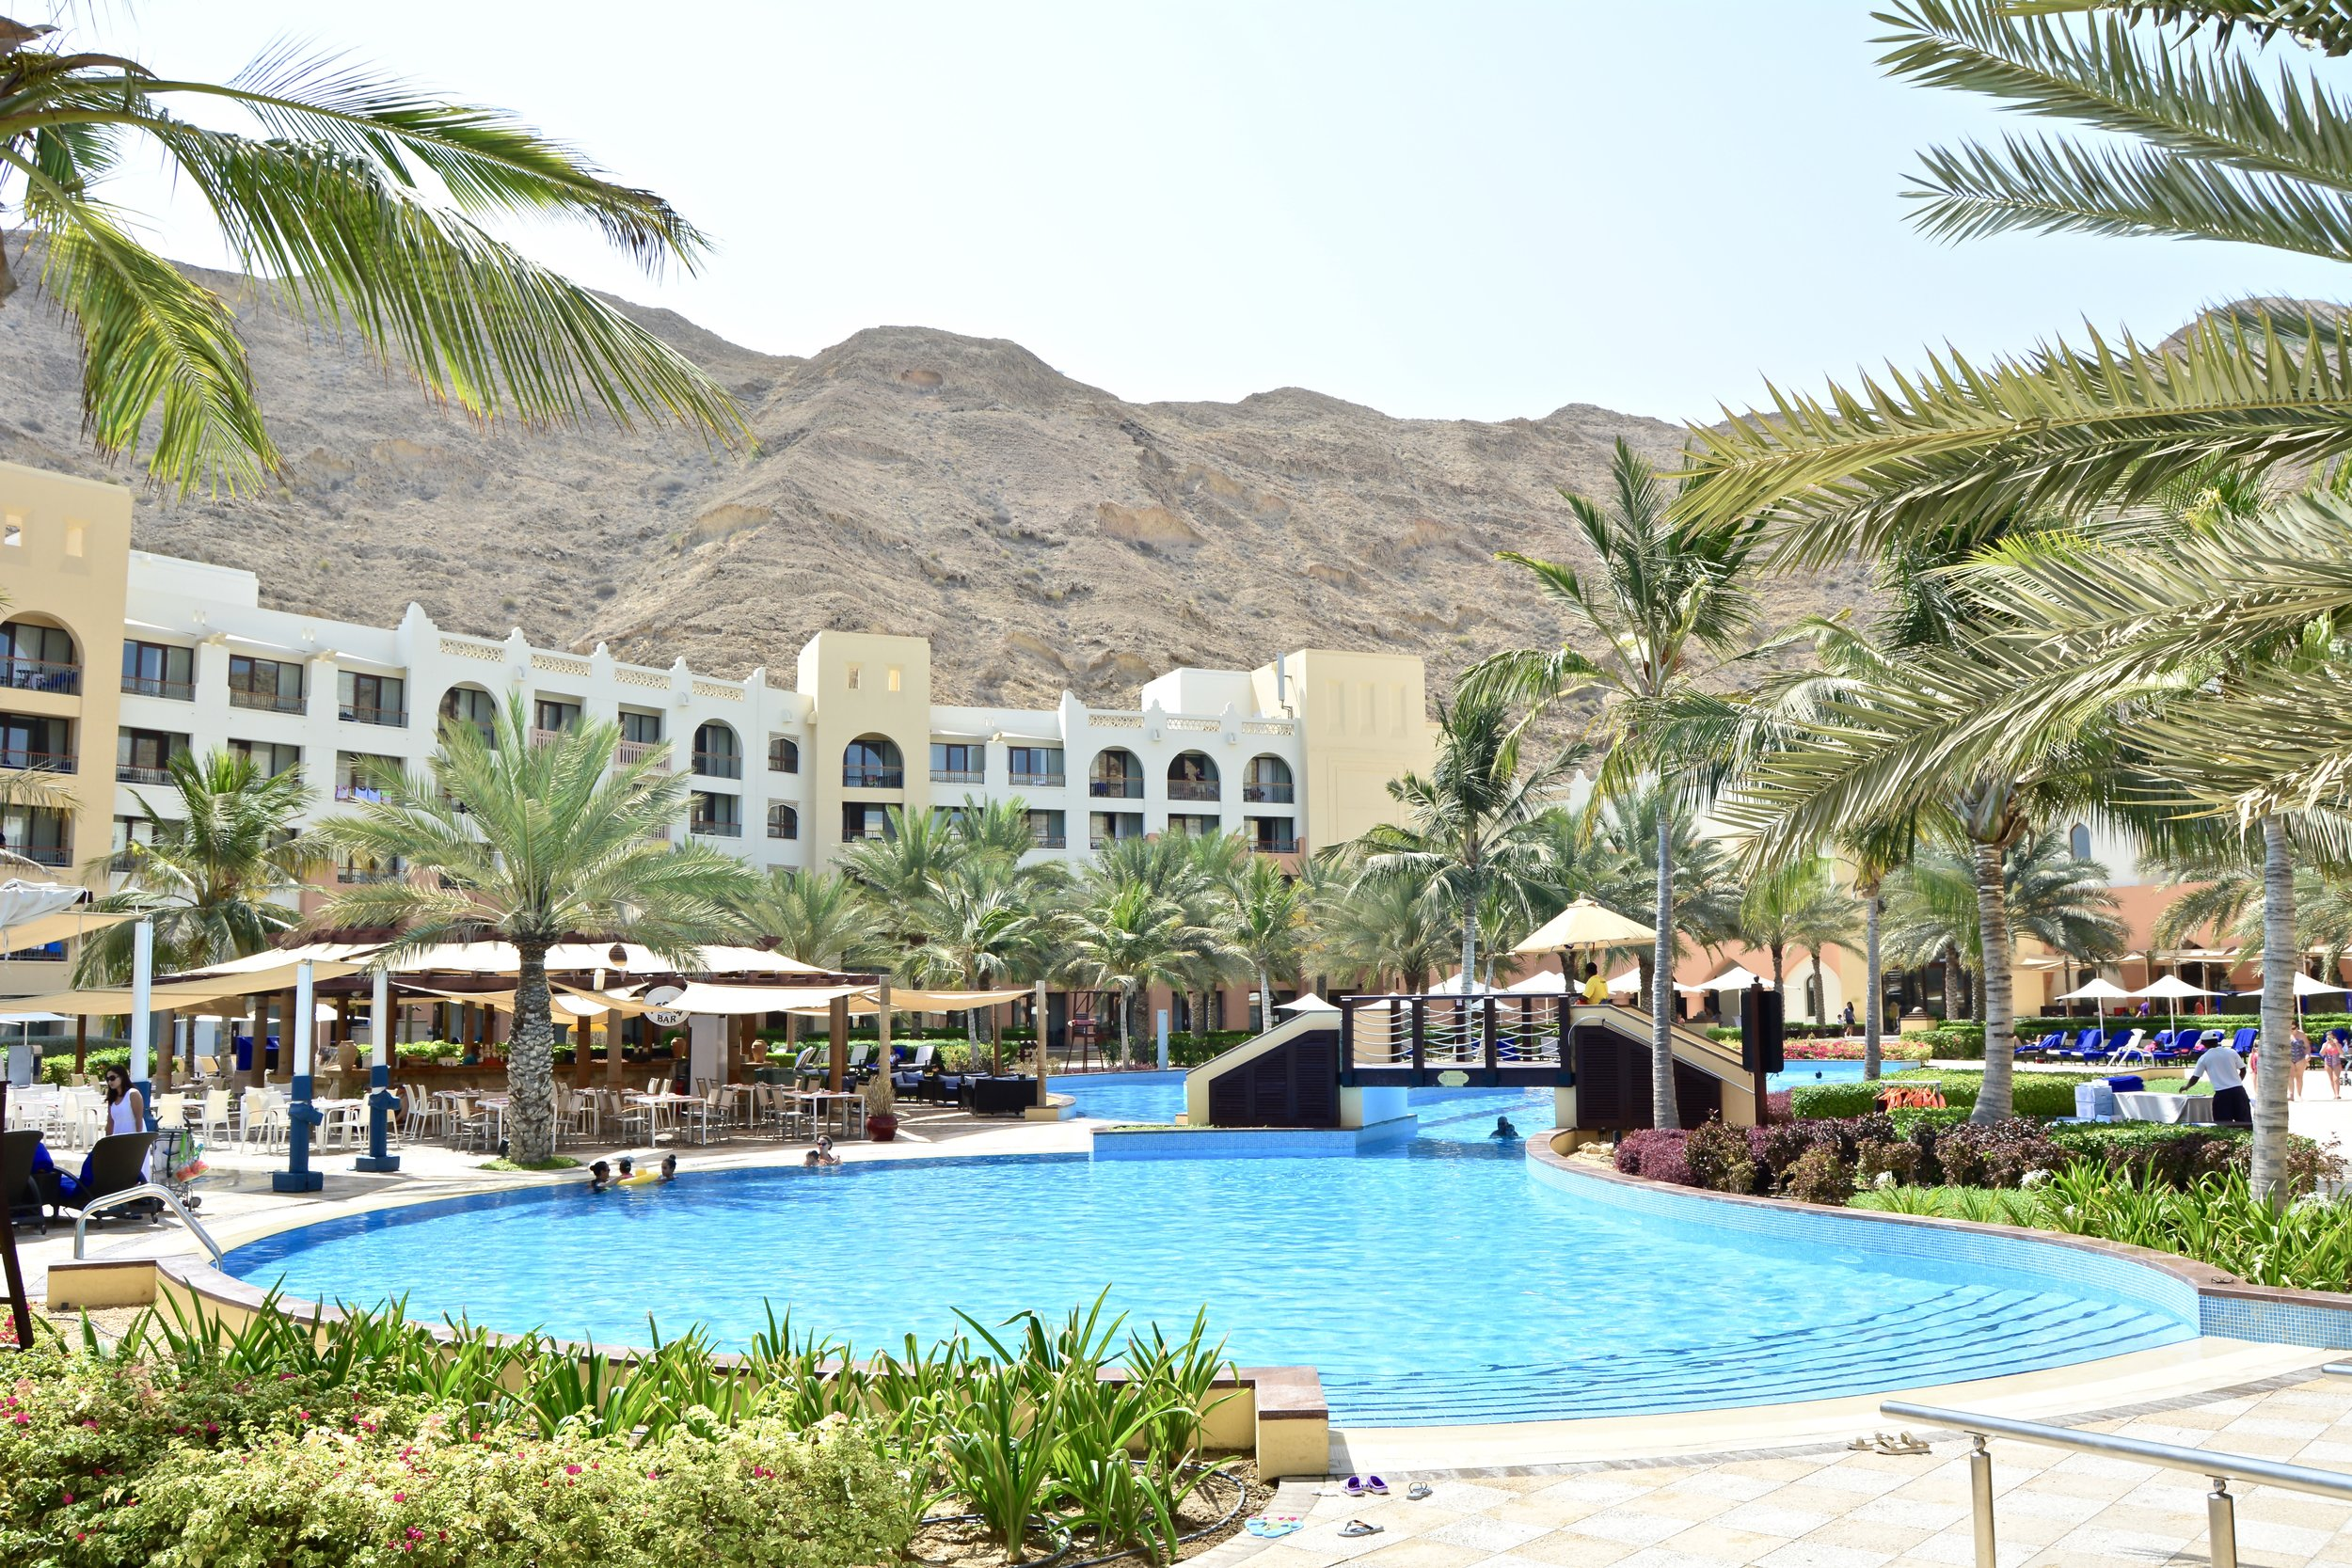 Al Waha - Swimming Pool (Shangri-La Muscat)